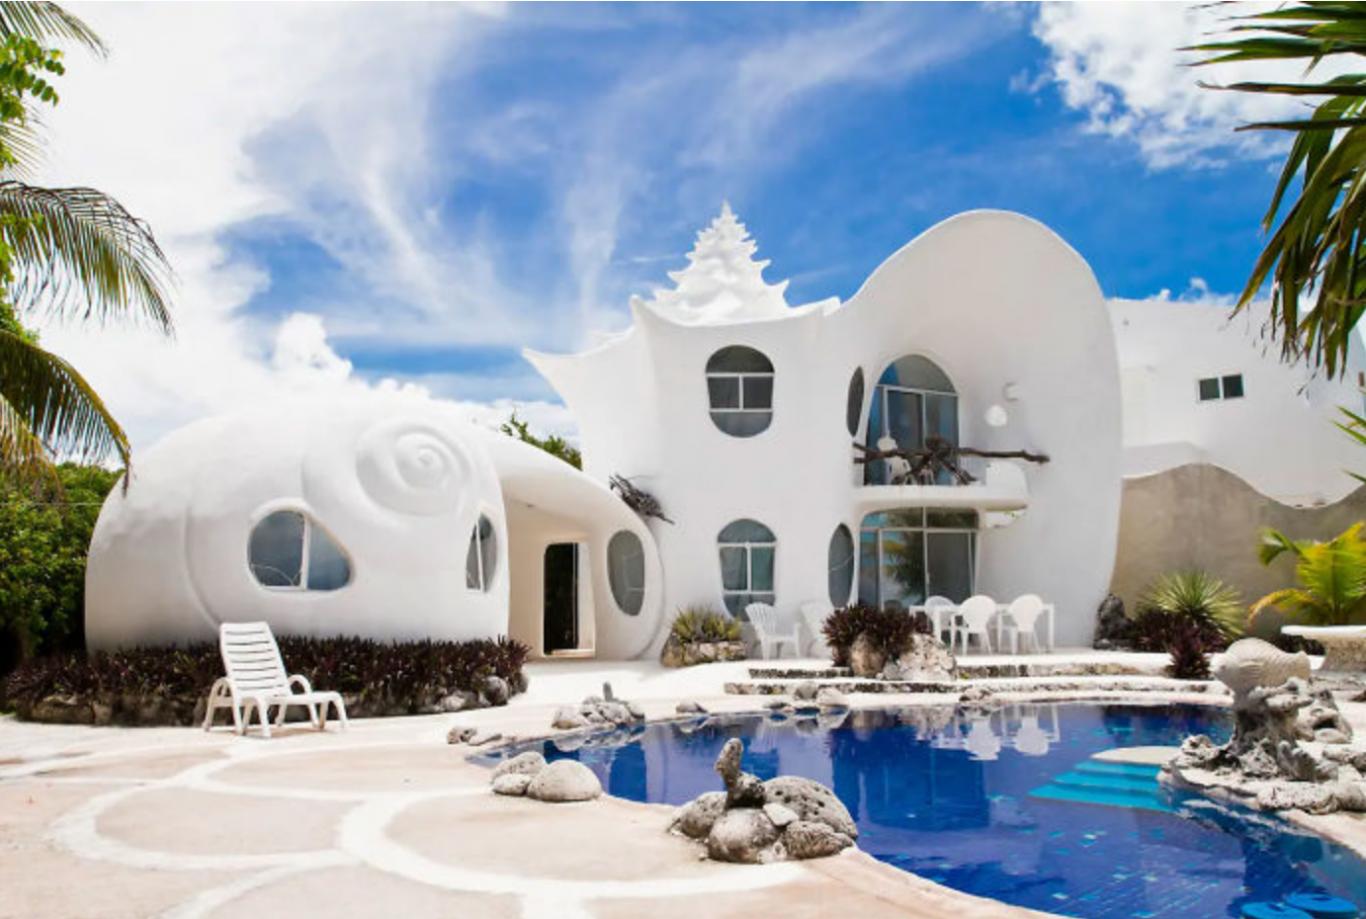 airbnb de sonho 2